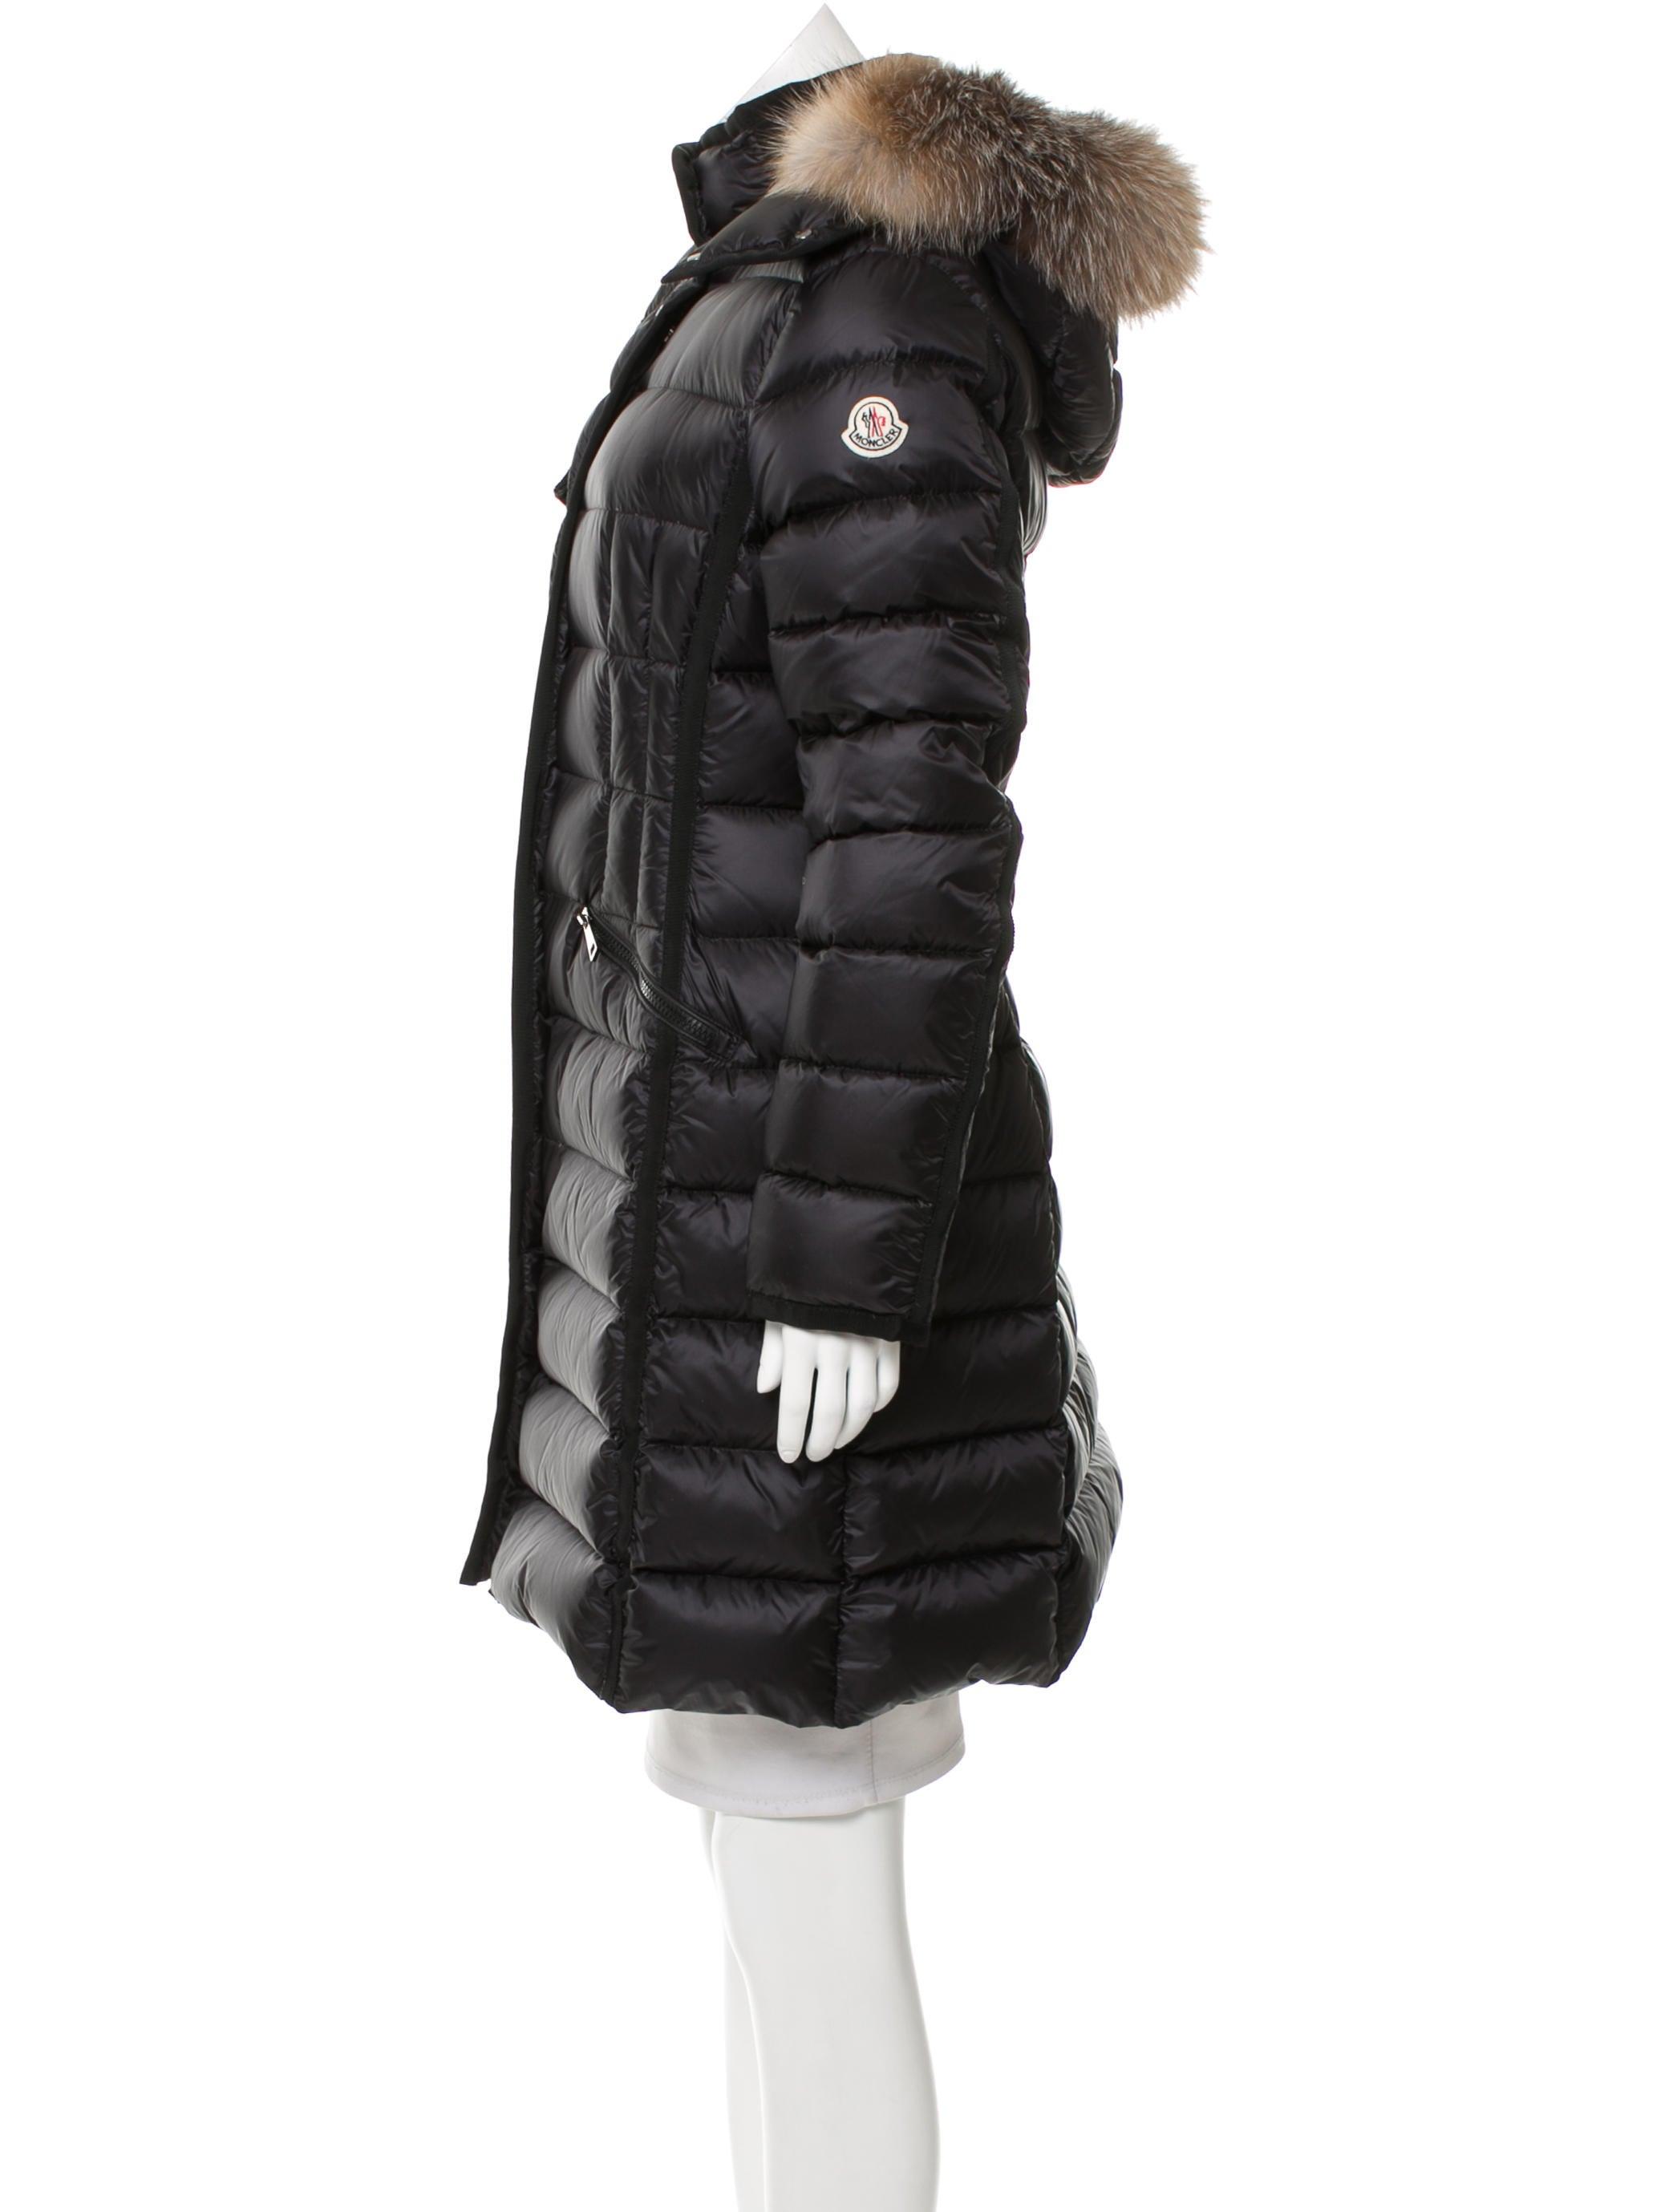 moncler hermifur jacket